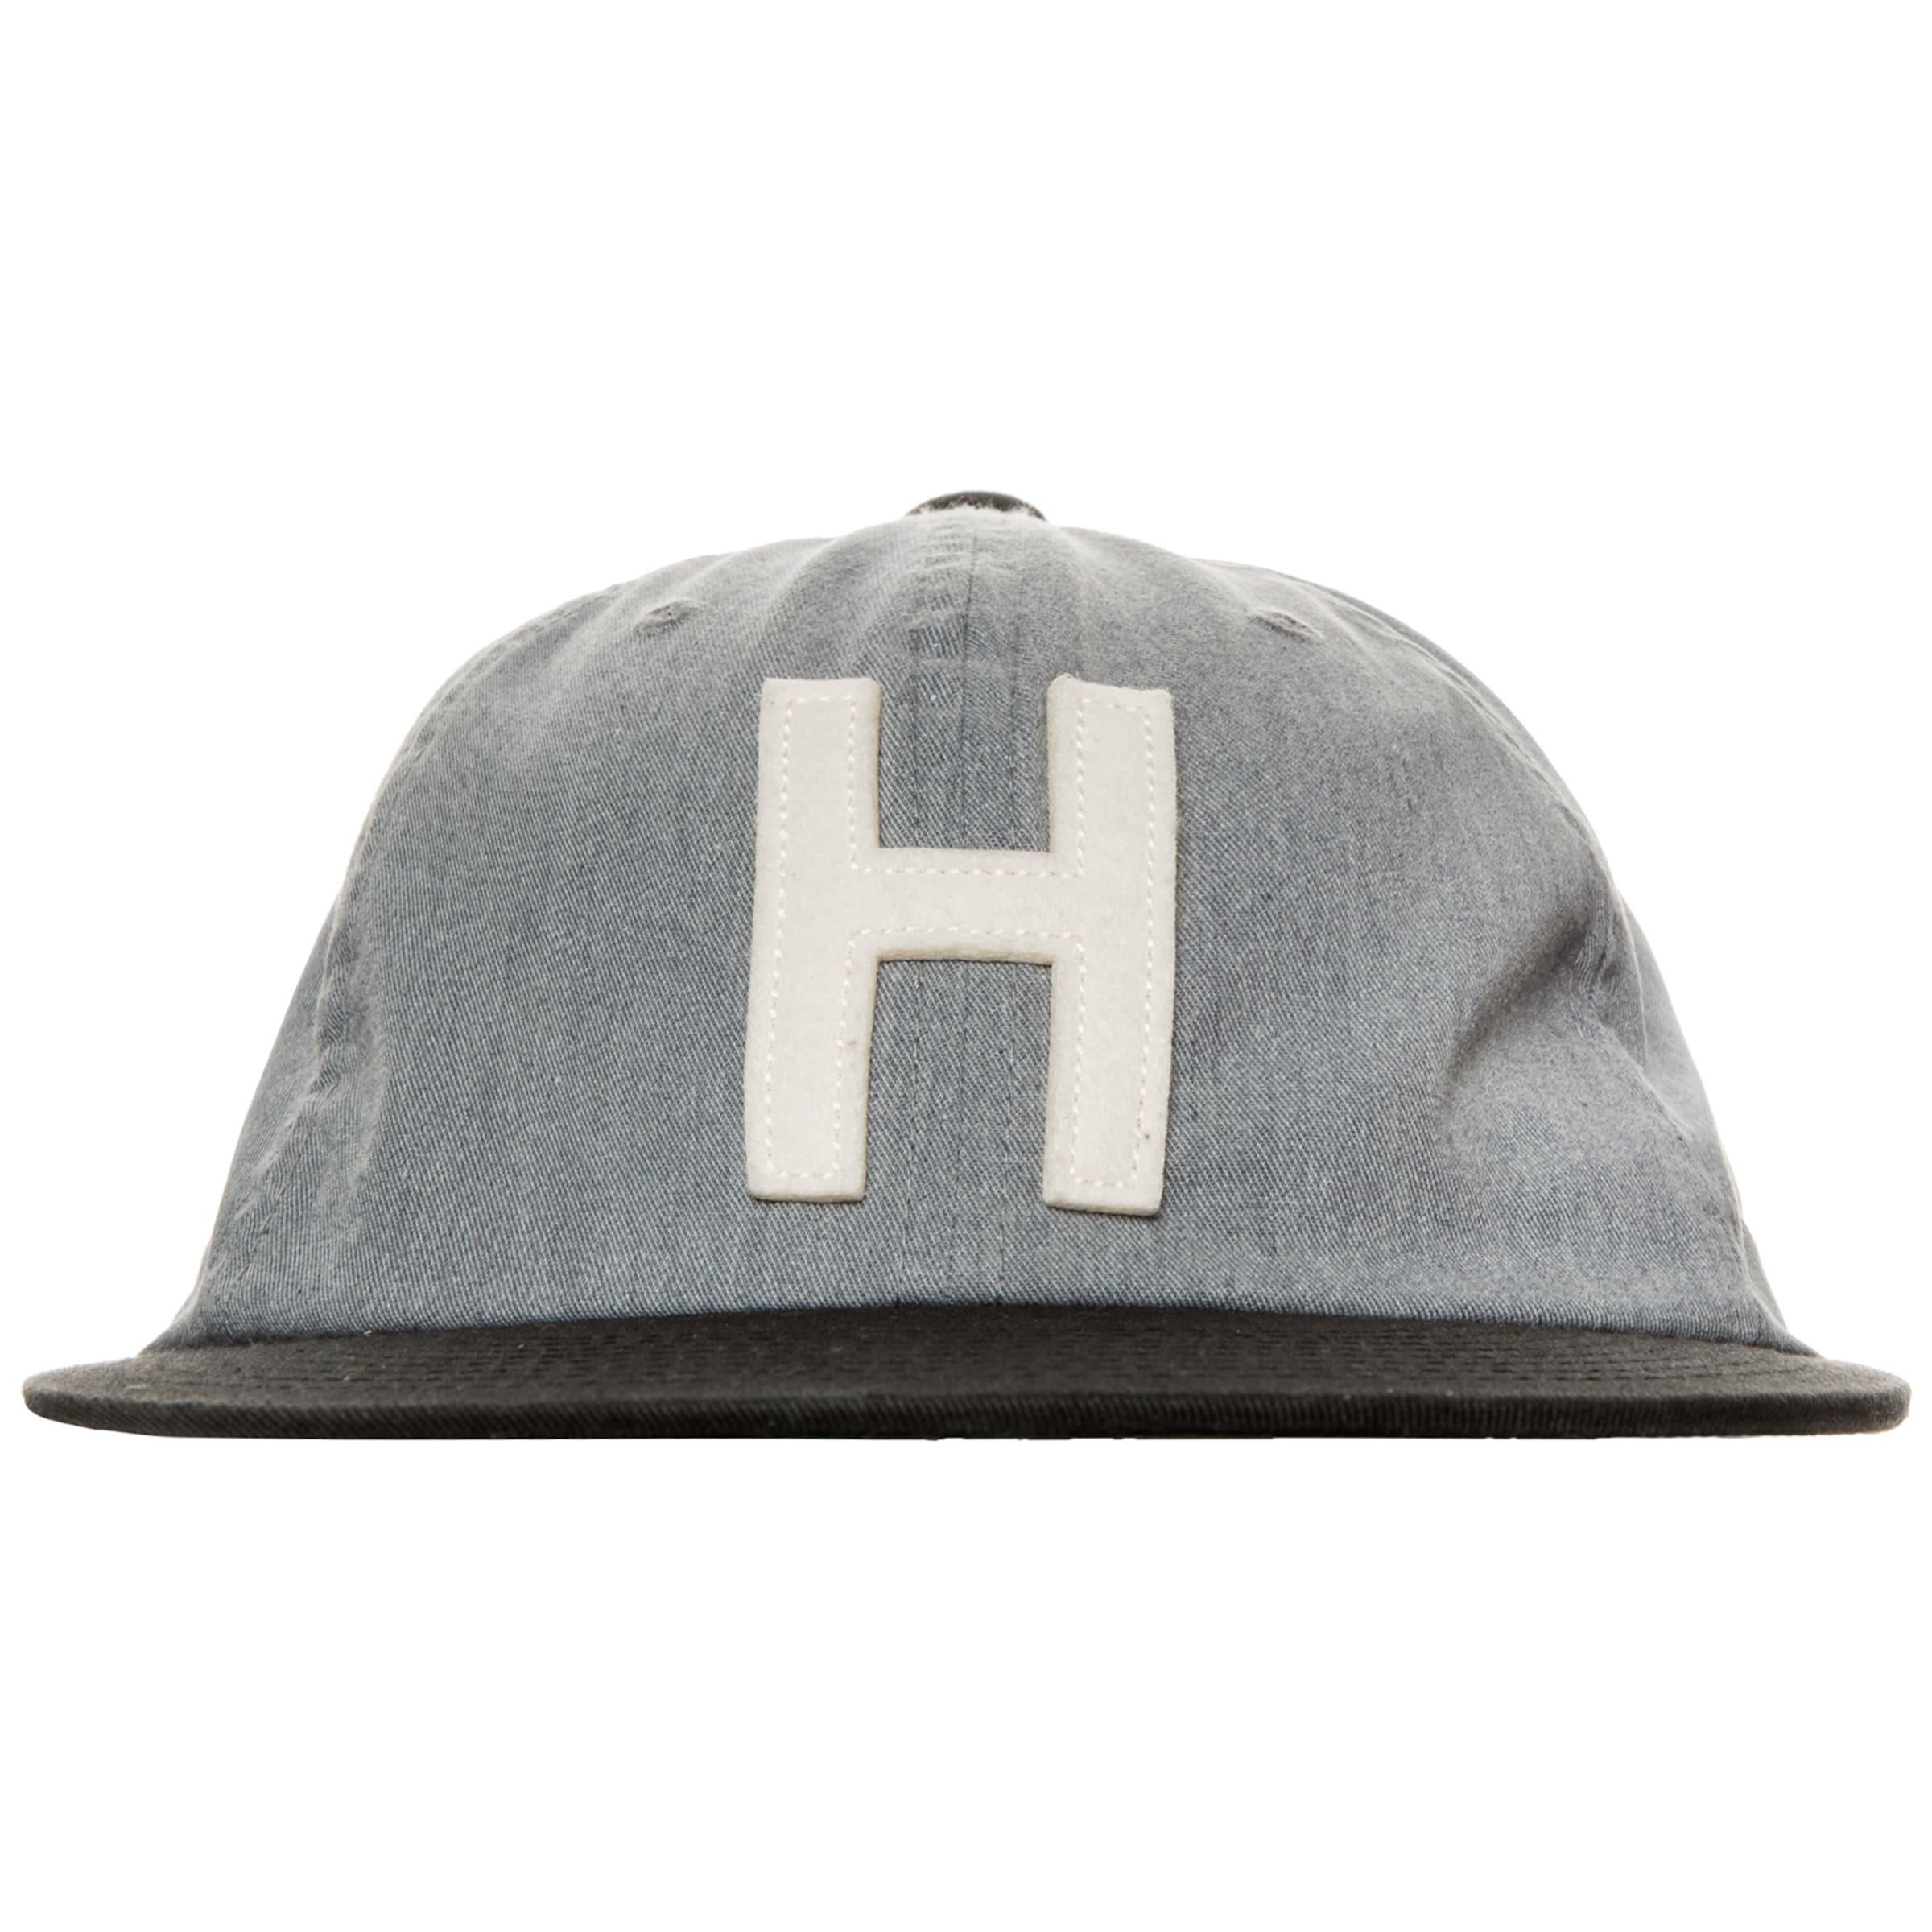 Herschel Cap 'Harwood Strapback' Rabatt Erschwinglich Bj5hn